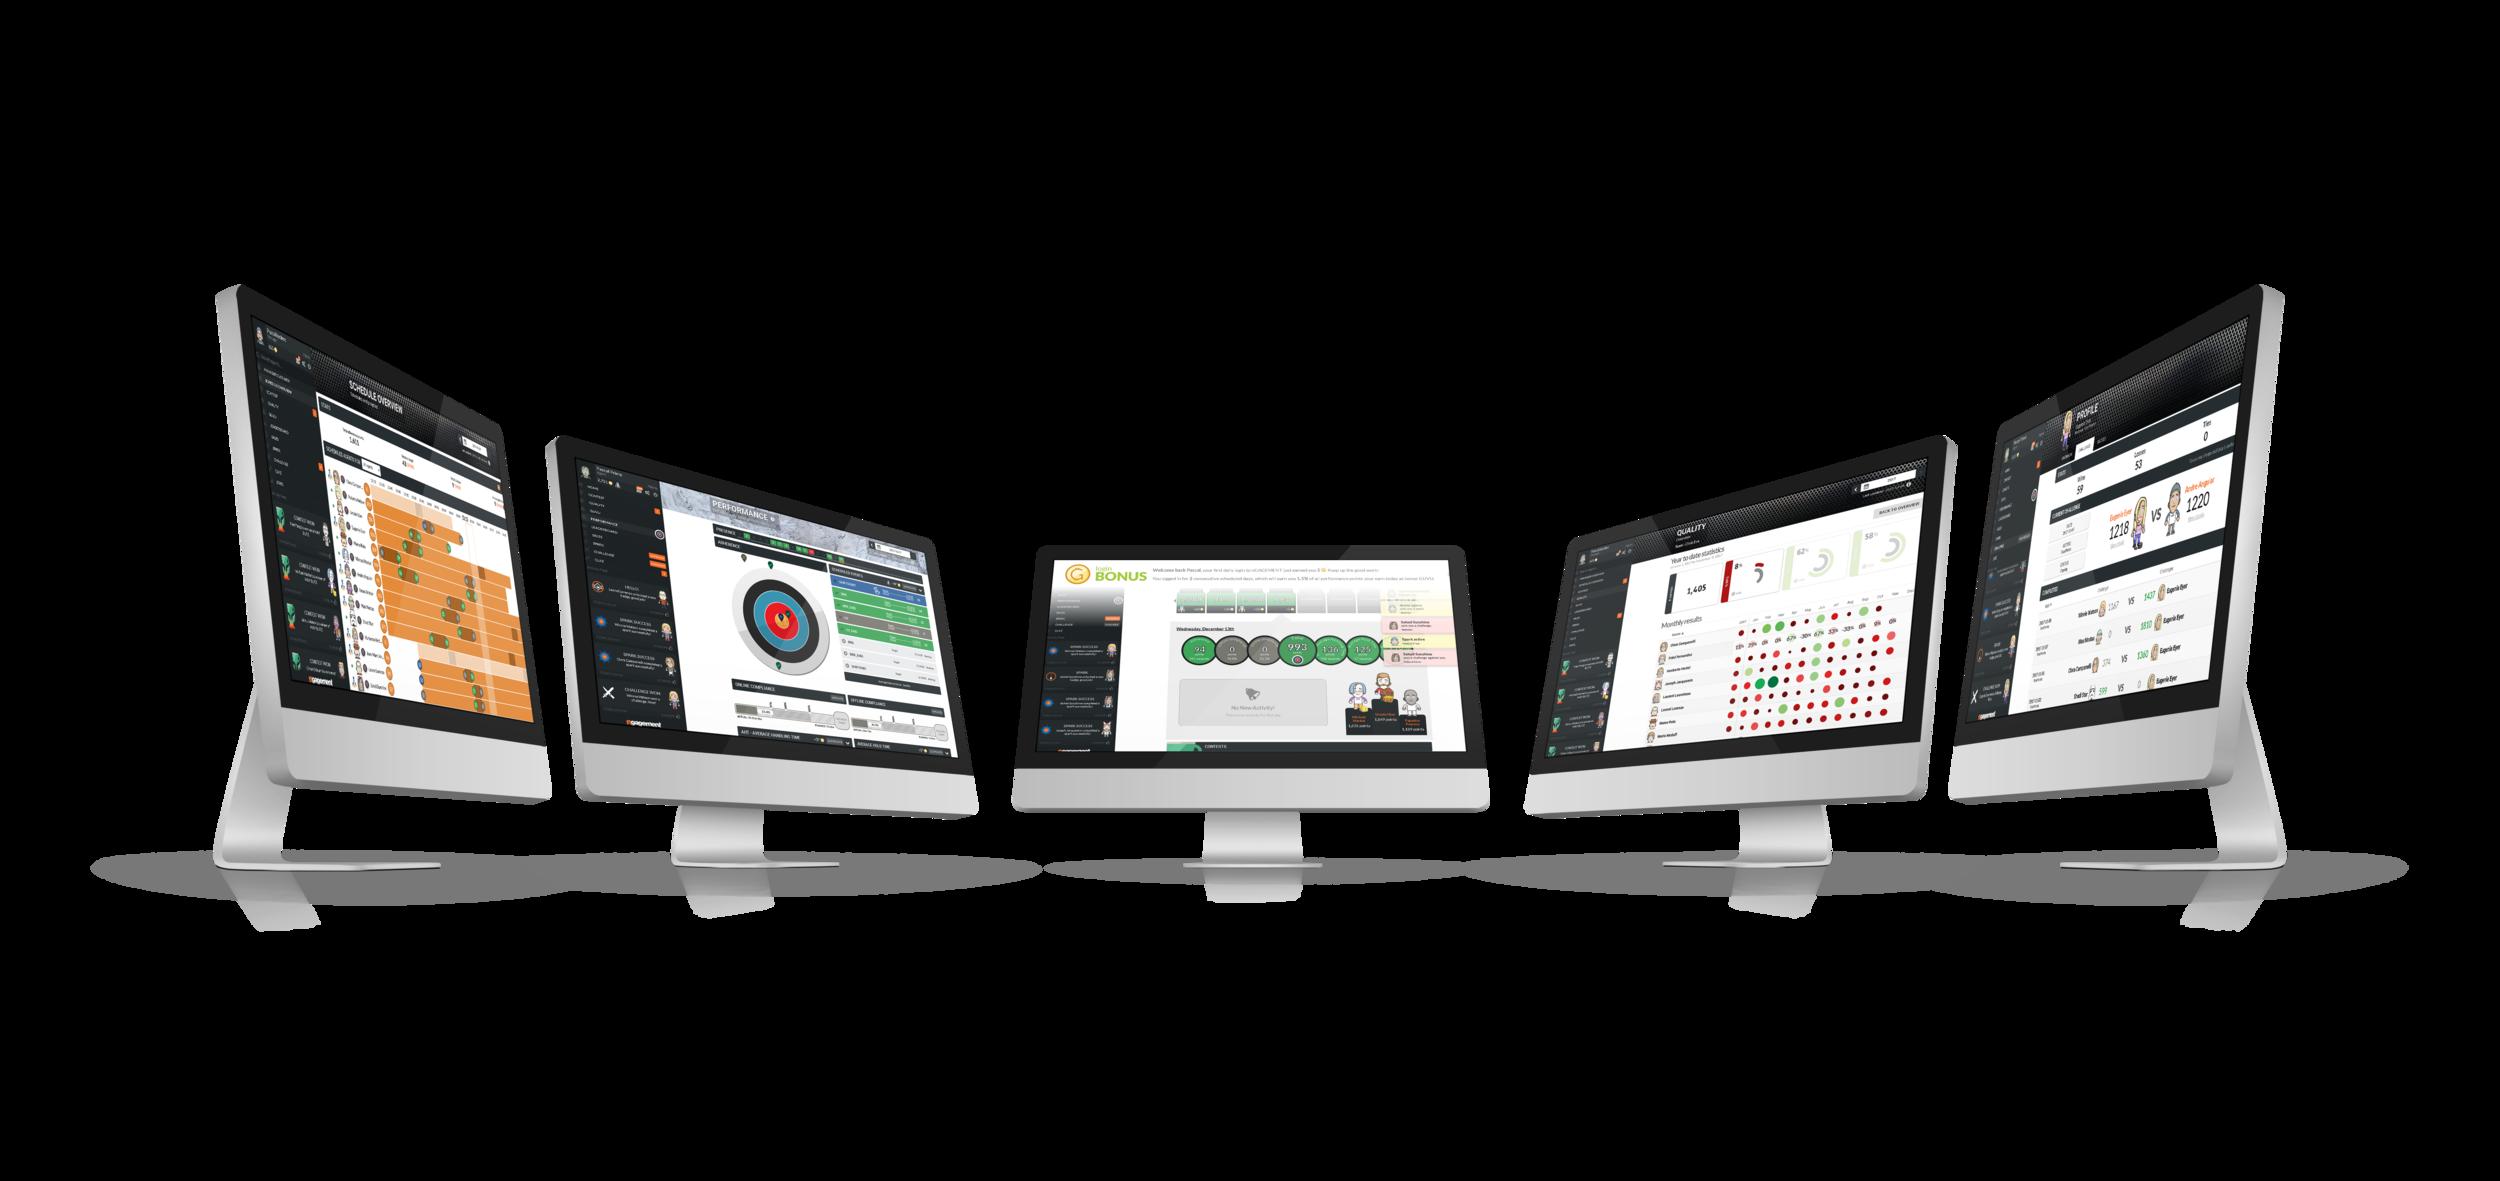 nGUVU gamification and employee engagement platform